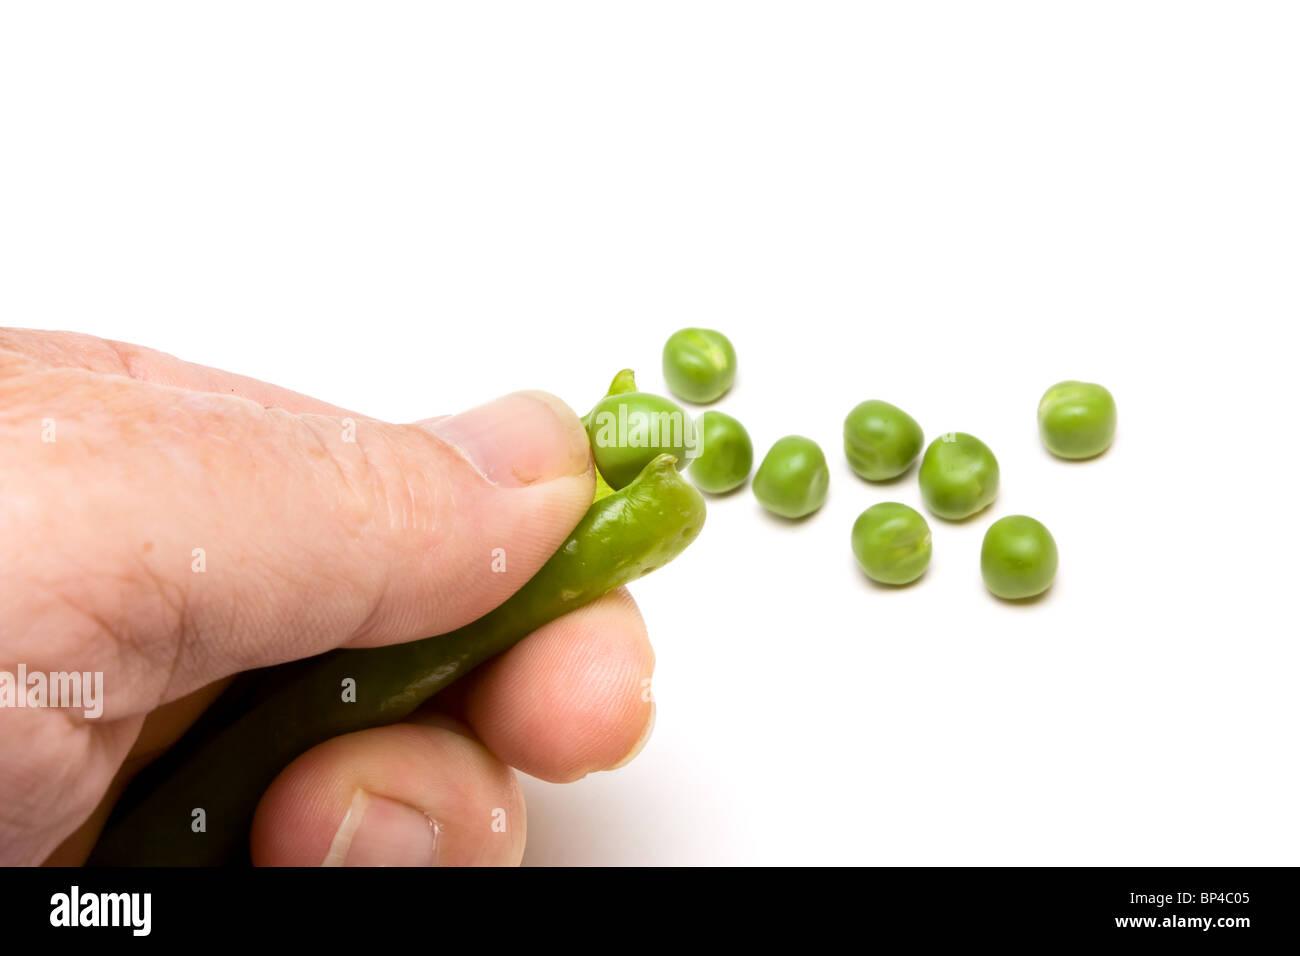 Shelling Fresh Garden Pea Pods isolated against white background. - Stock Image